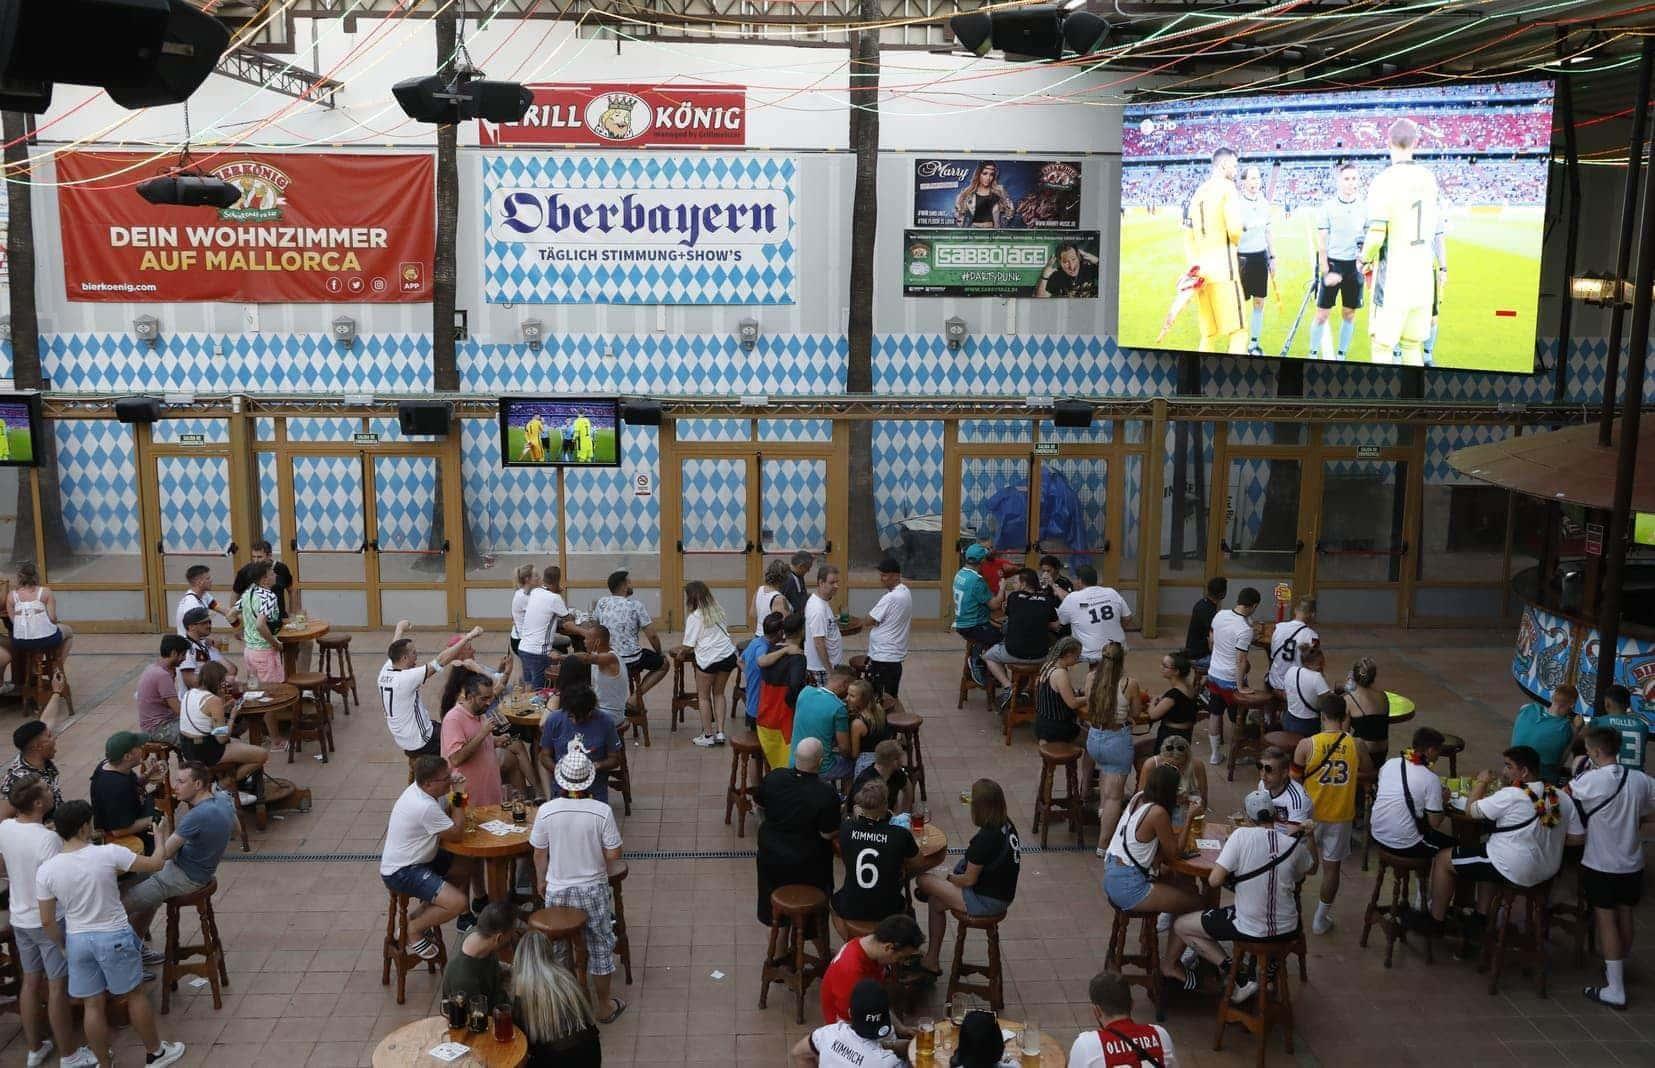 Public Viewing Mallorca Bierkönig EM 2021 1